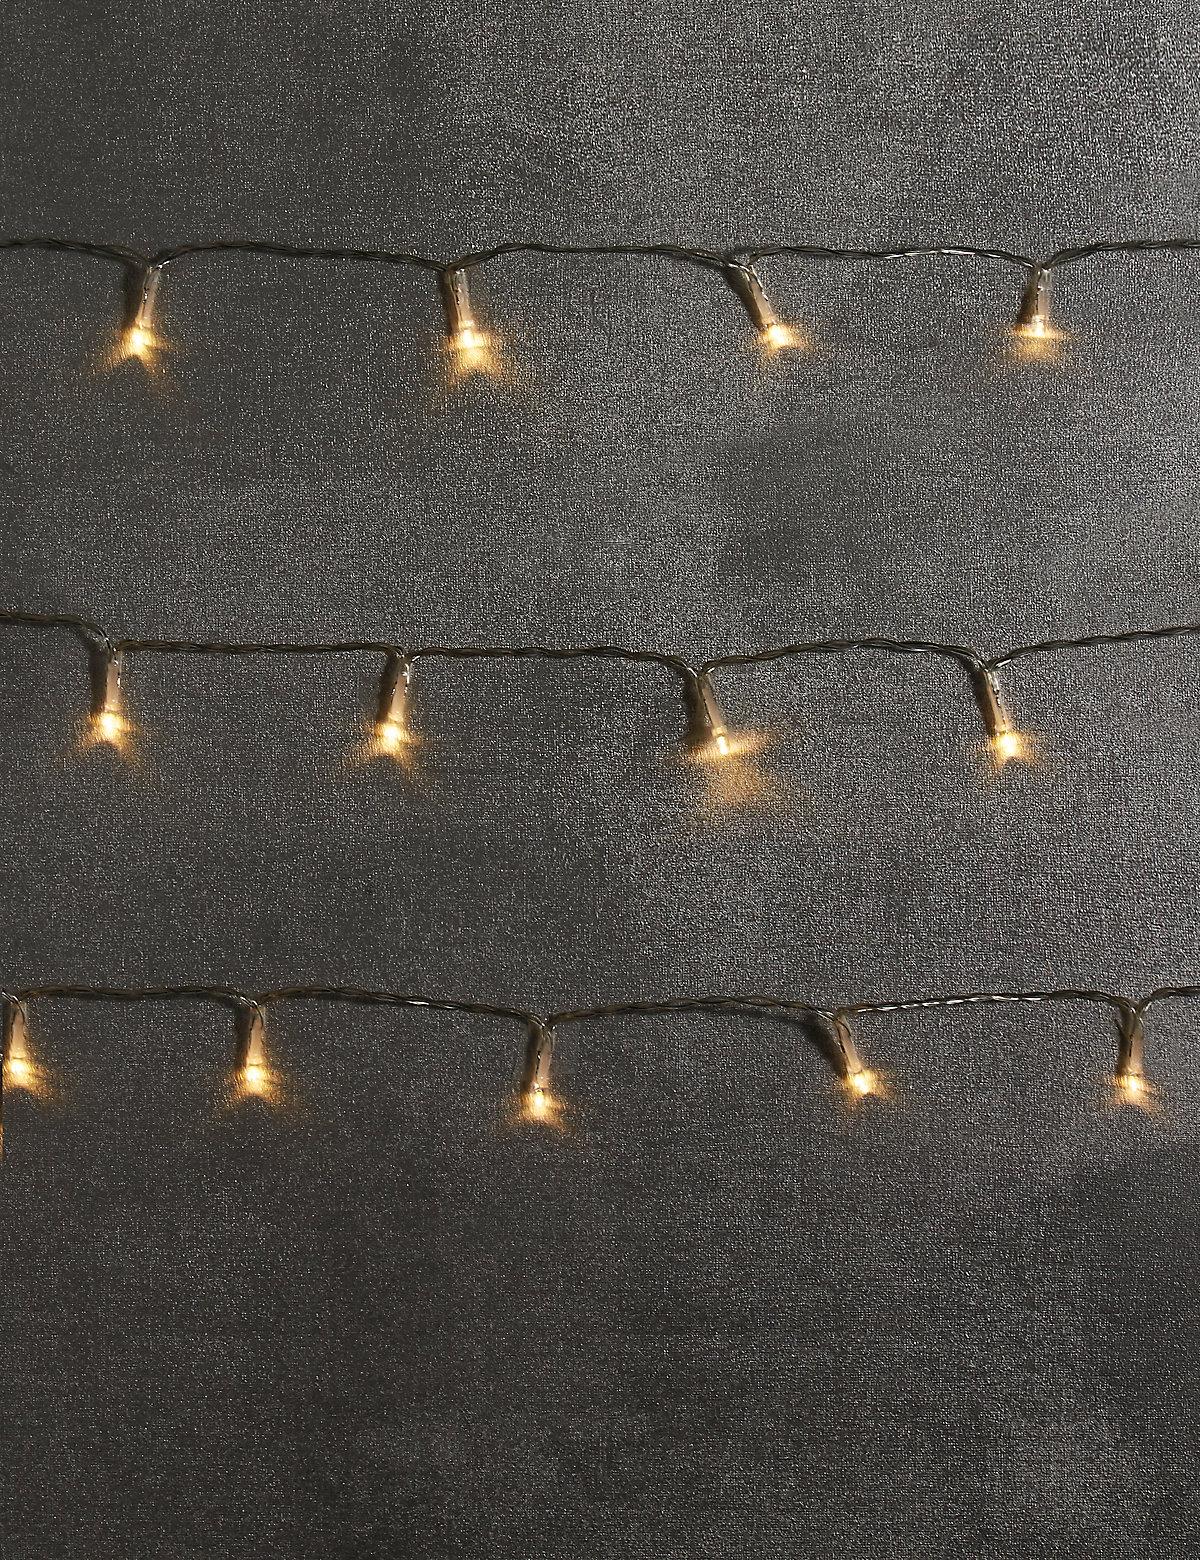 20 Warm White LED Lights